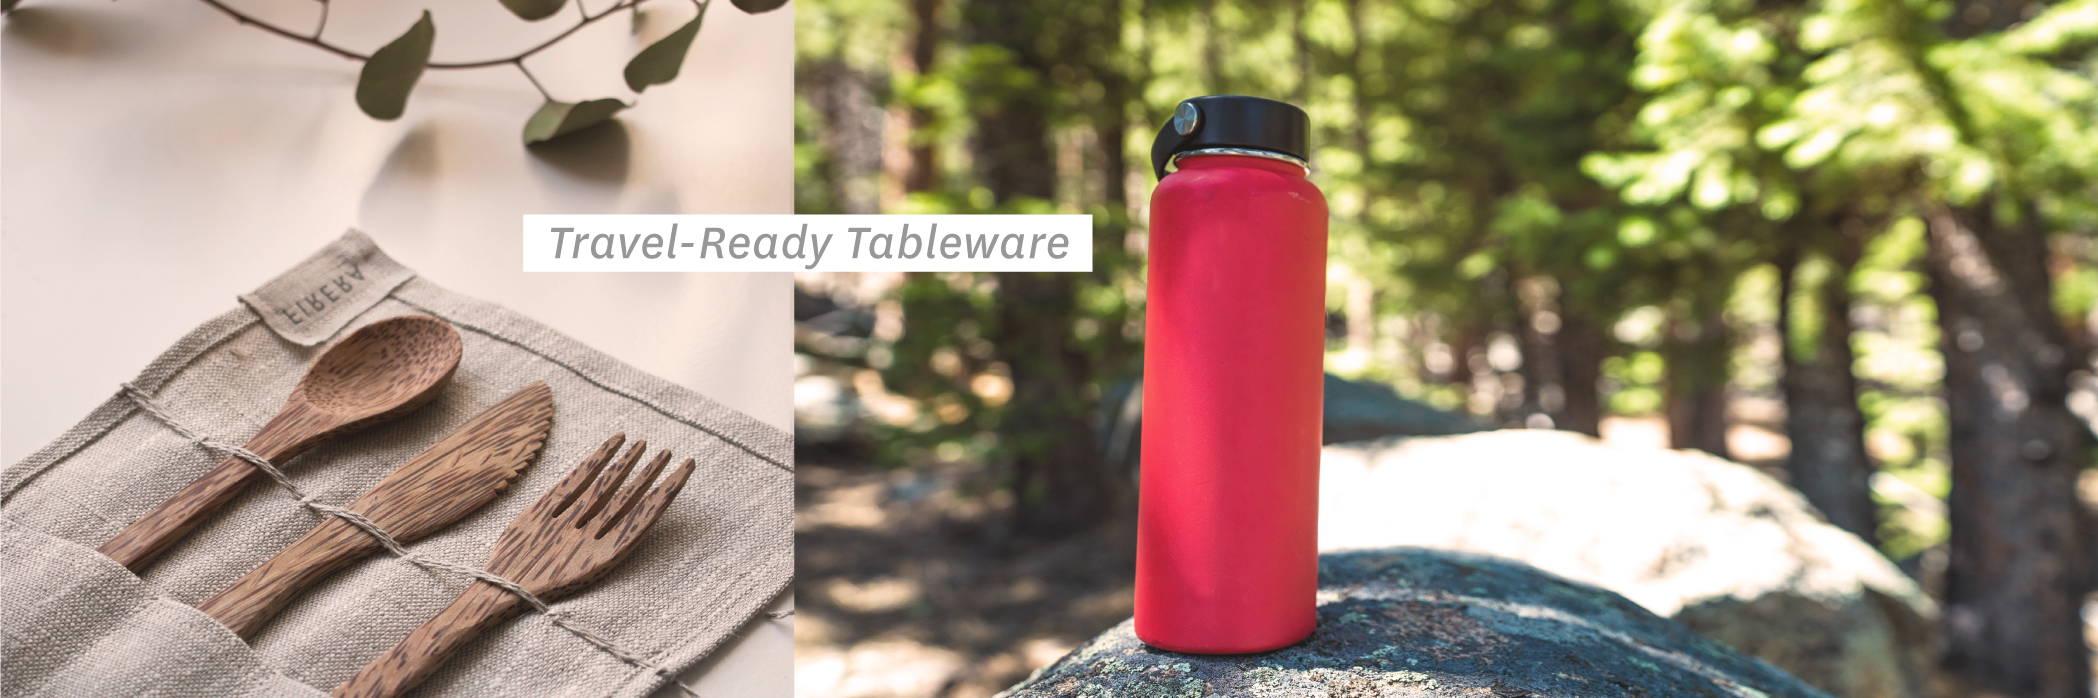 TRavel-Ready Tableware